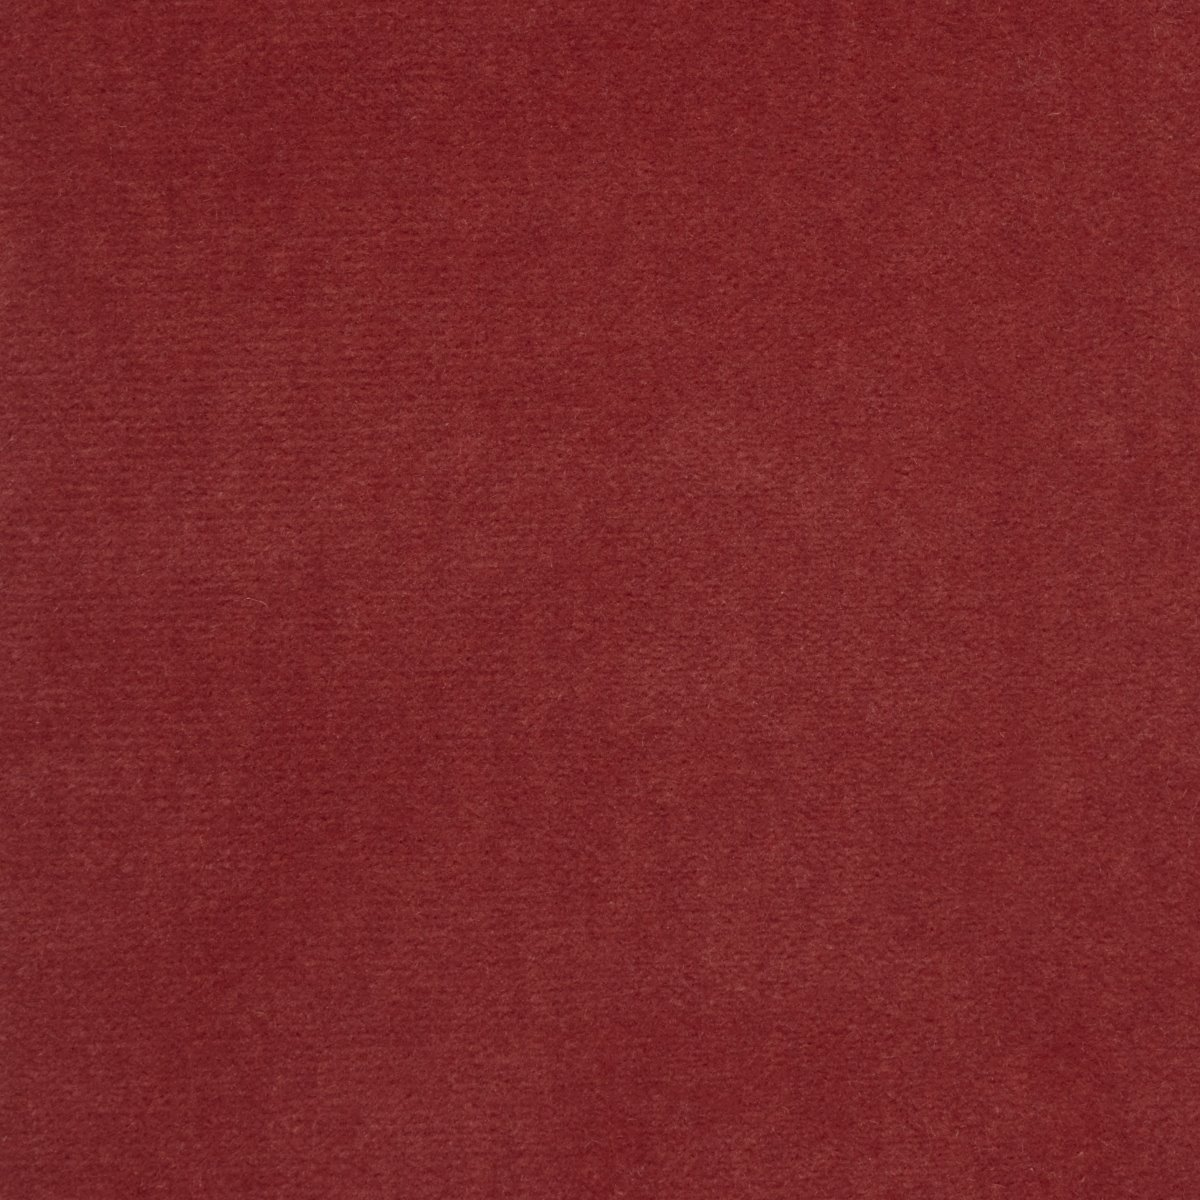 Bernard Thorp Fabric And